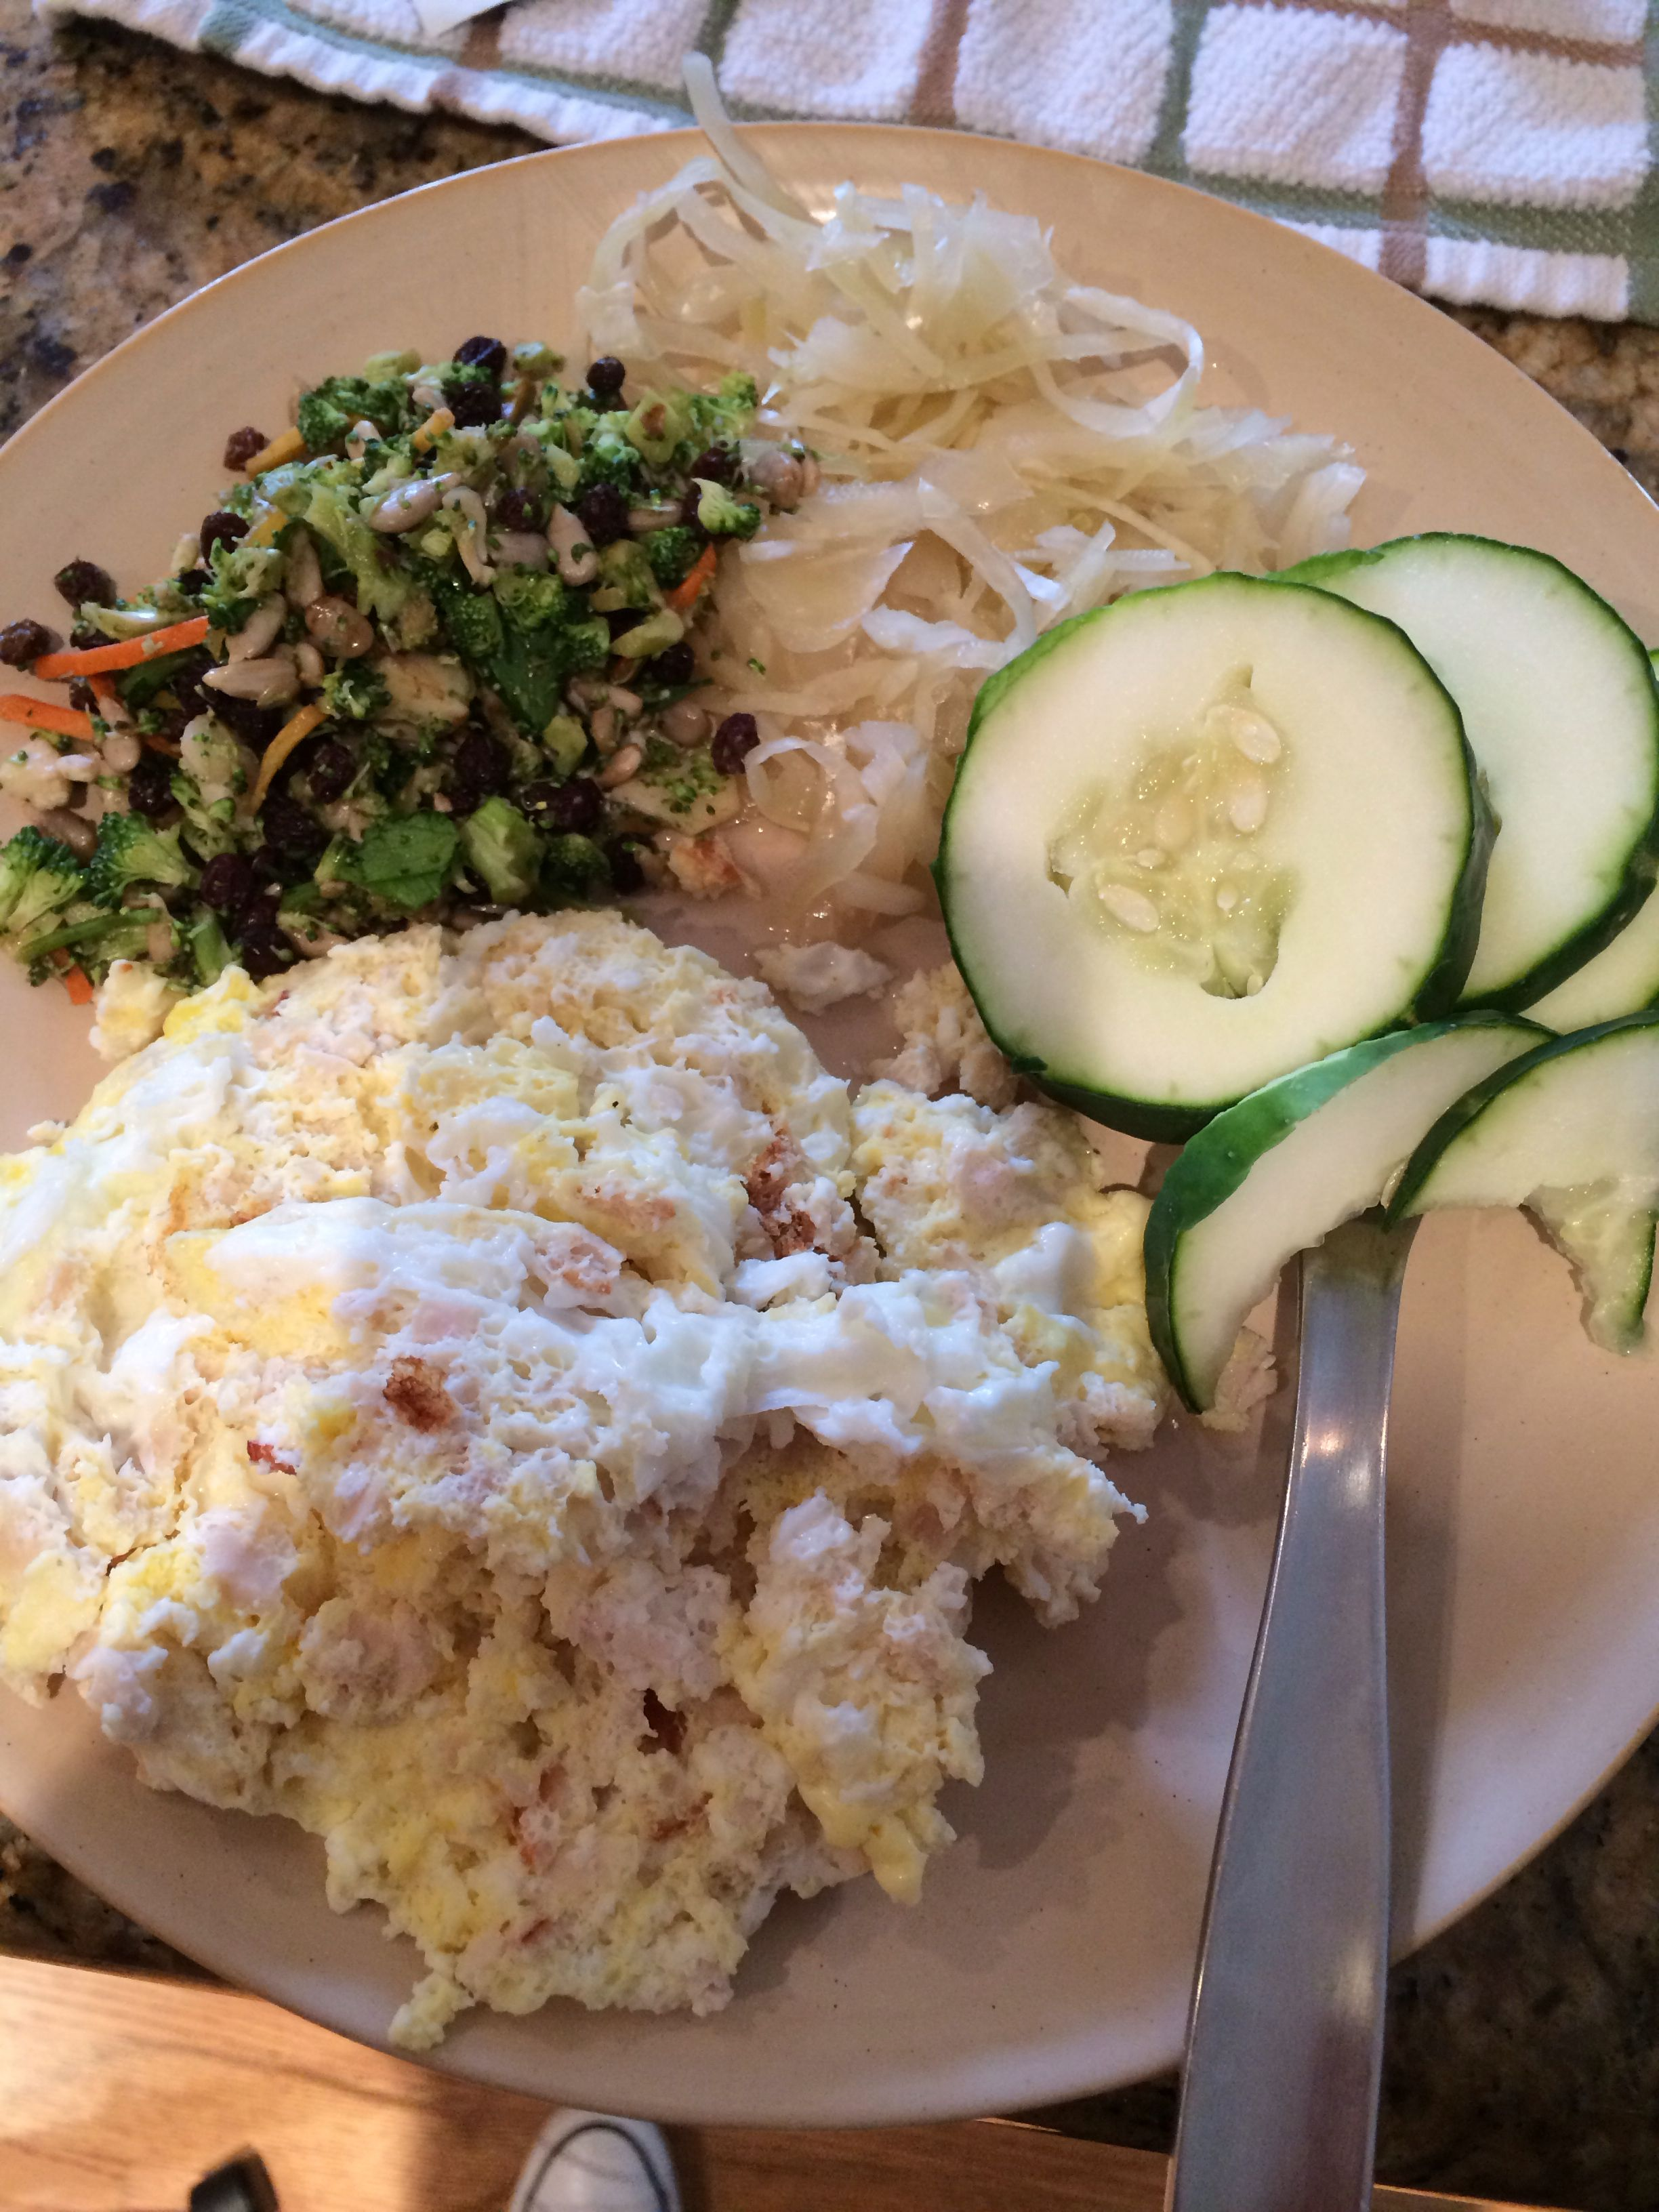 Desayuno salud @acostatiffy